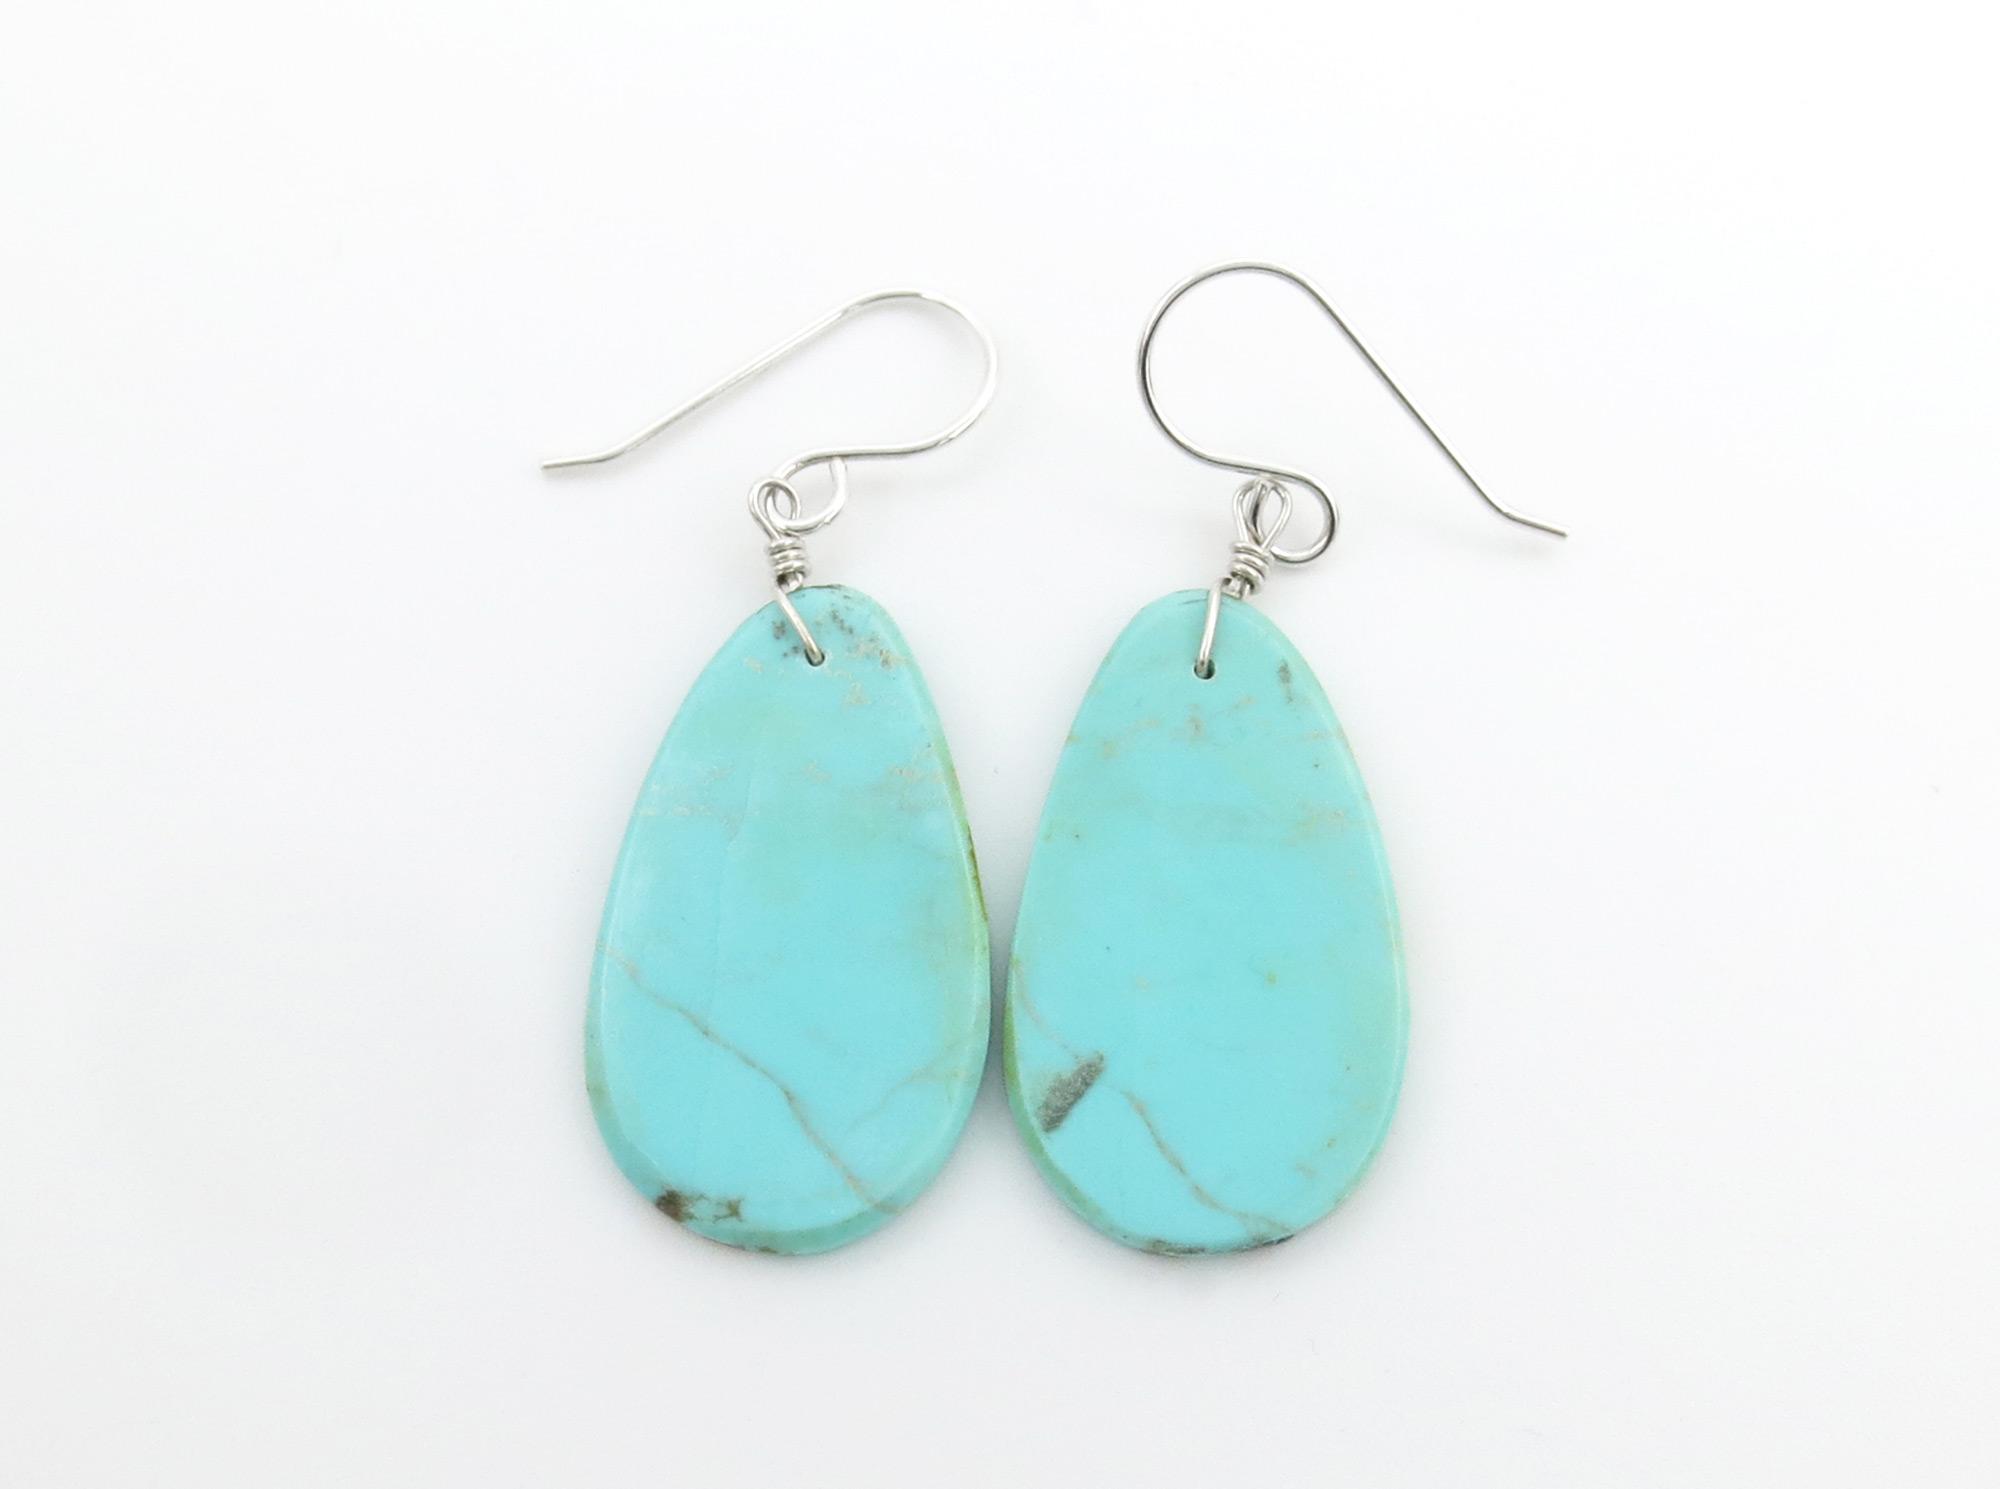 Santo Domingo Jewelry Turquoise Slab Earrings Chavez - 6258pl